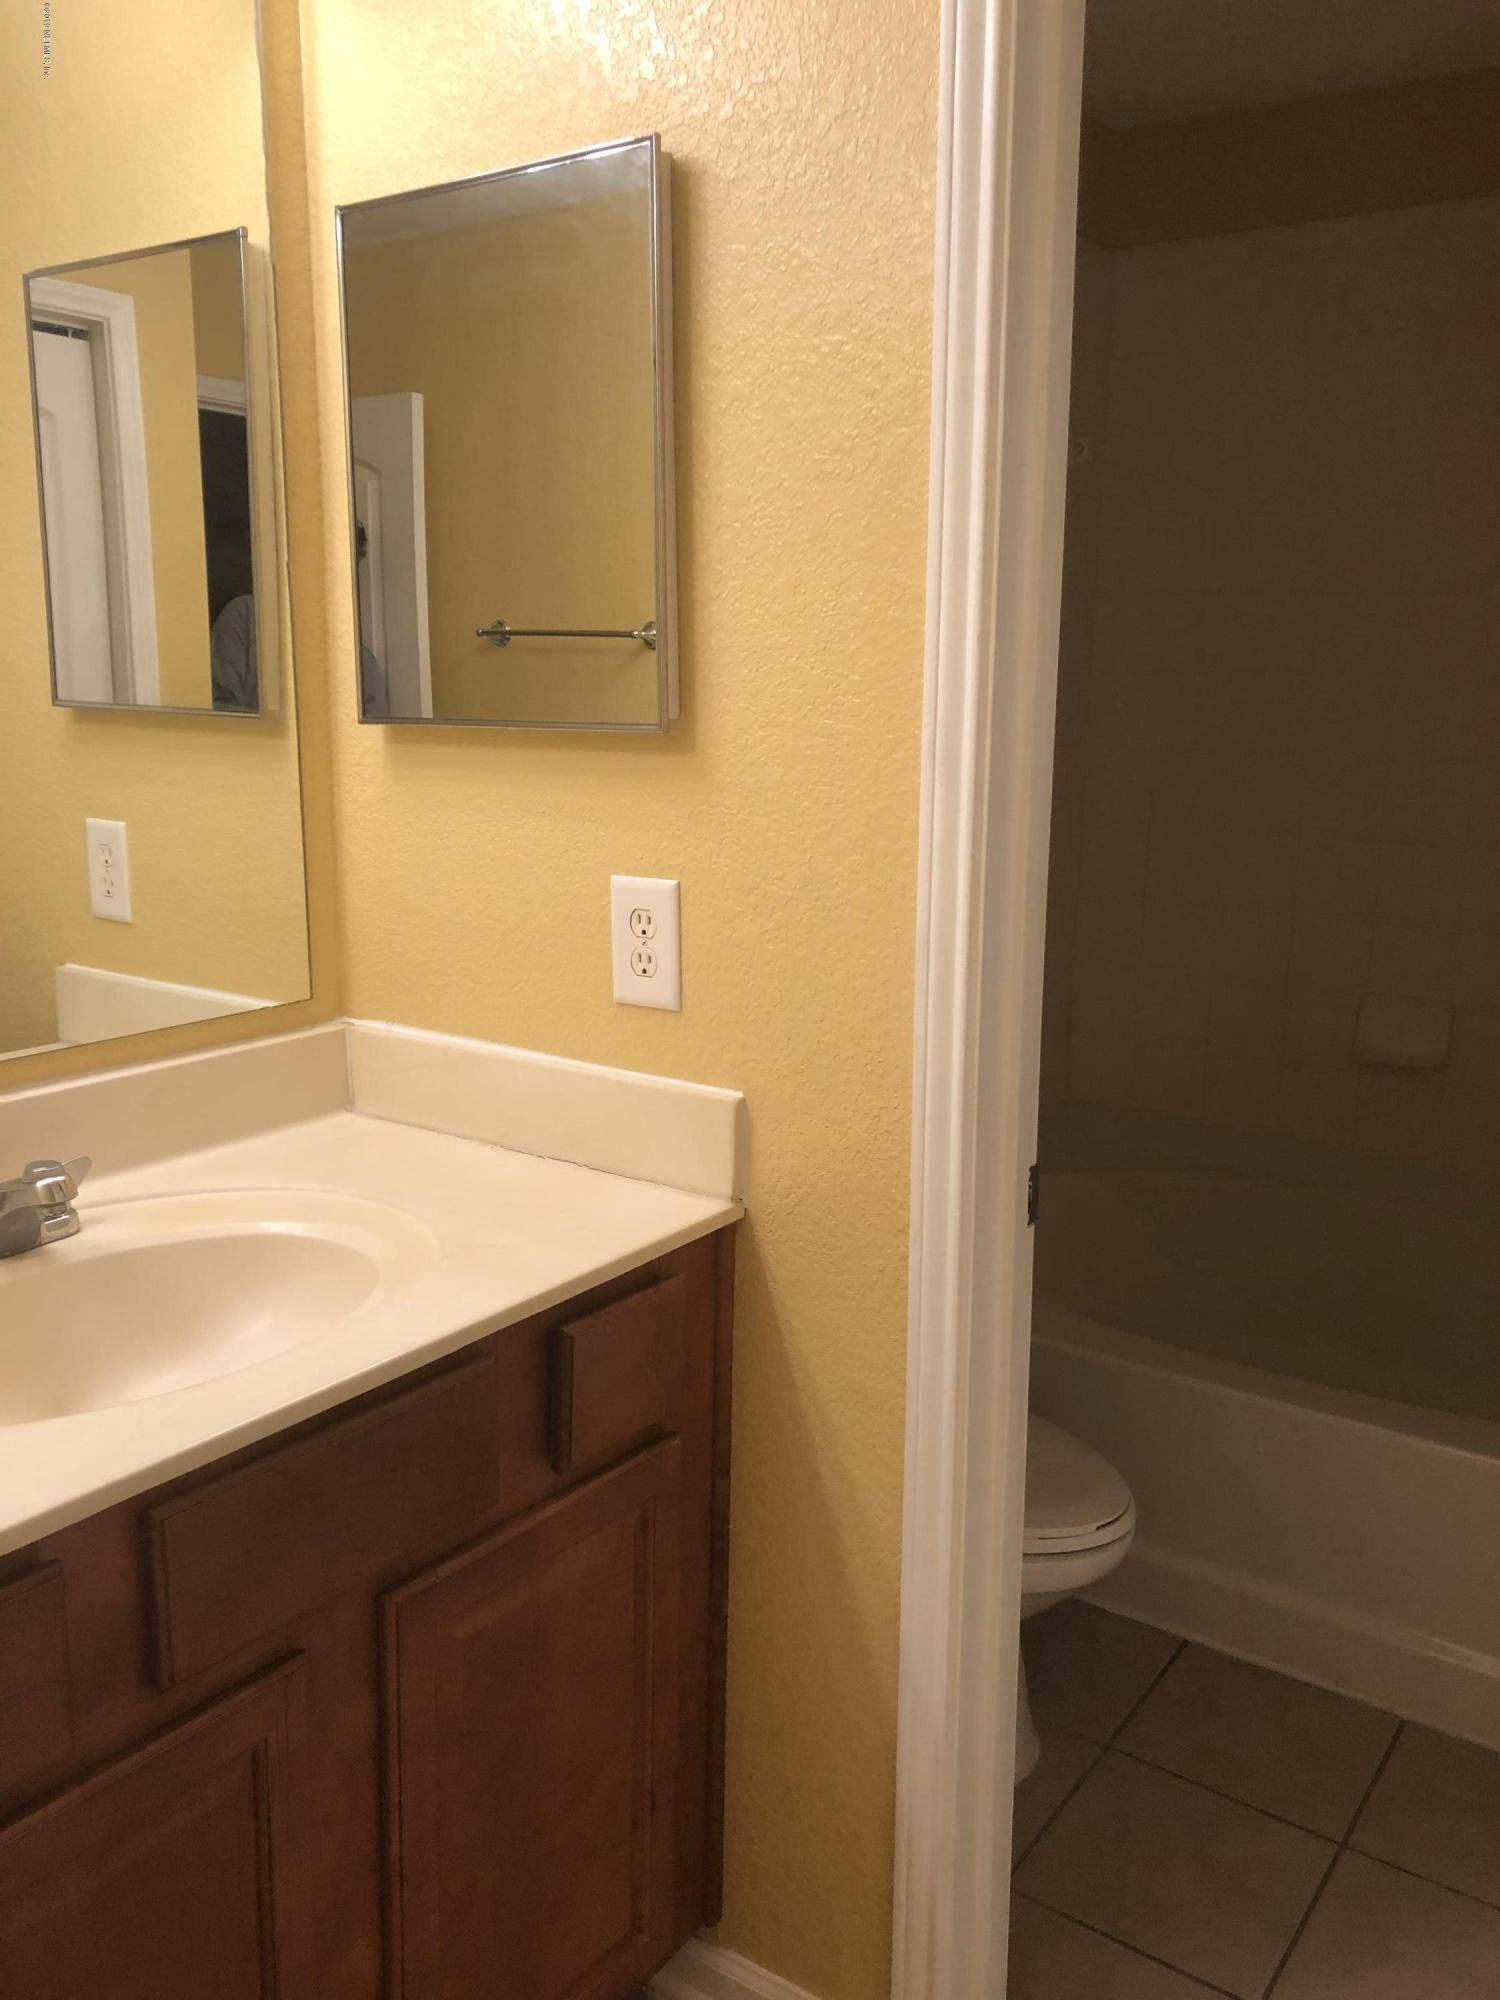 10200 BELLE RIVE- JACKSONVILLE- FLORIDA 32256, 3 Bedrooms Bedrooms, ,2 BathroomsBathrooms,Condo,For sale,BELLE RIVE,988964